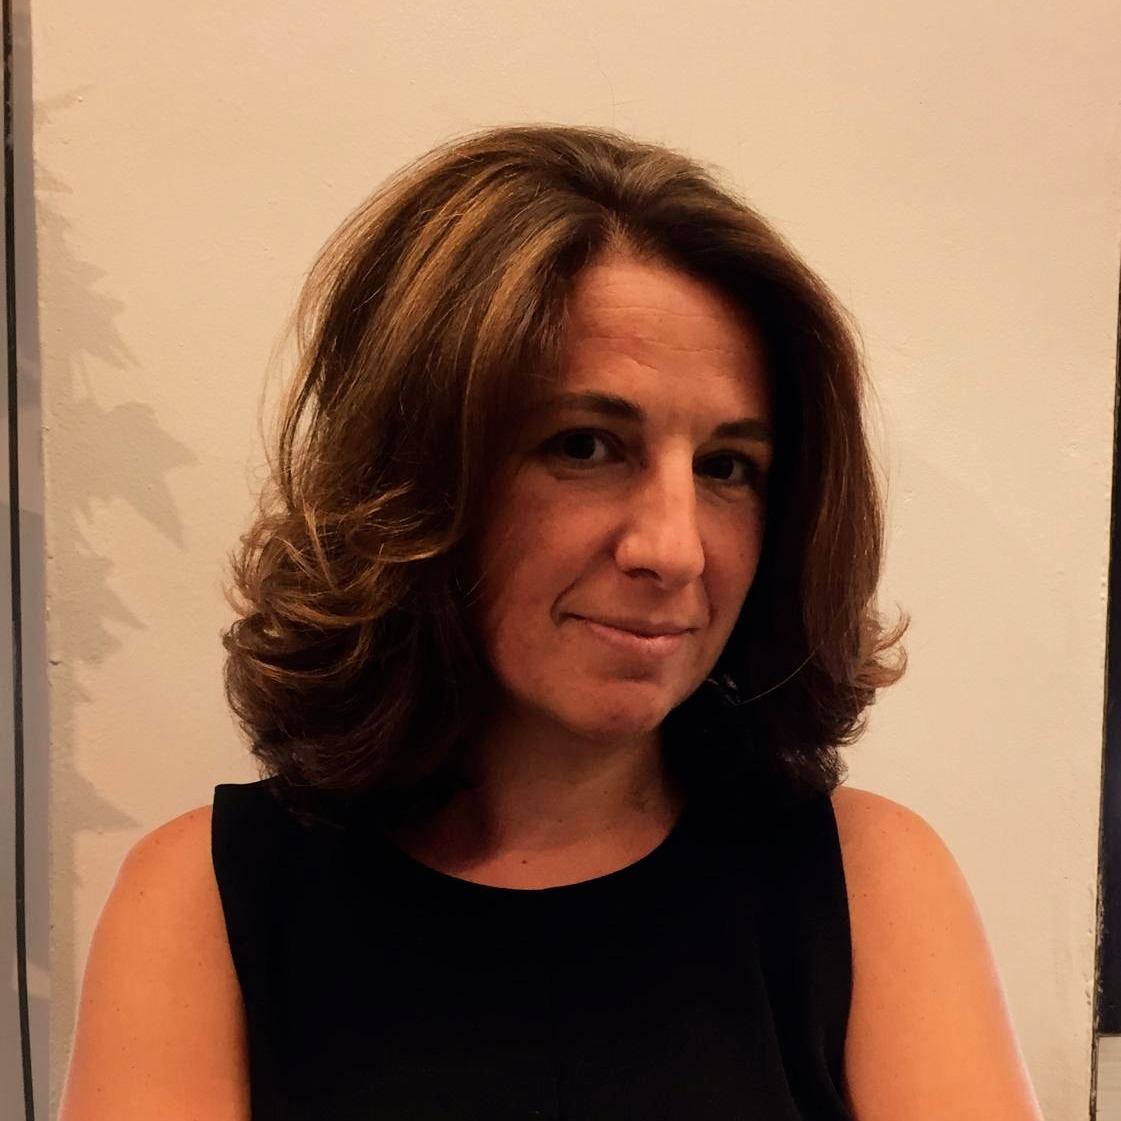 Dott.ssa Gaia Cavallotti